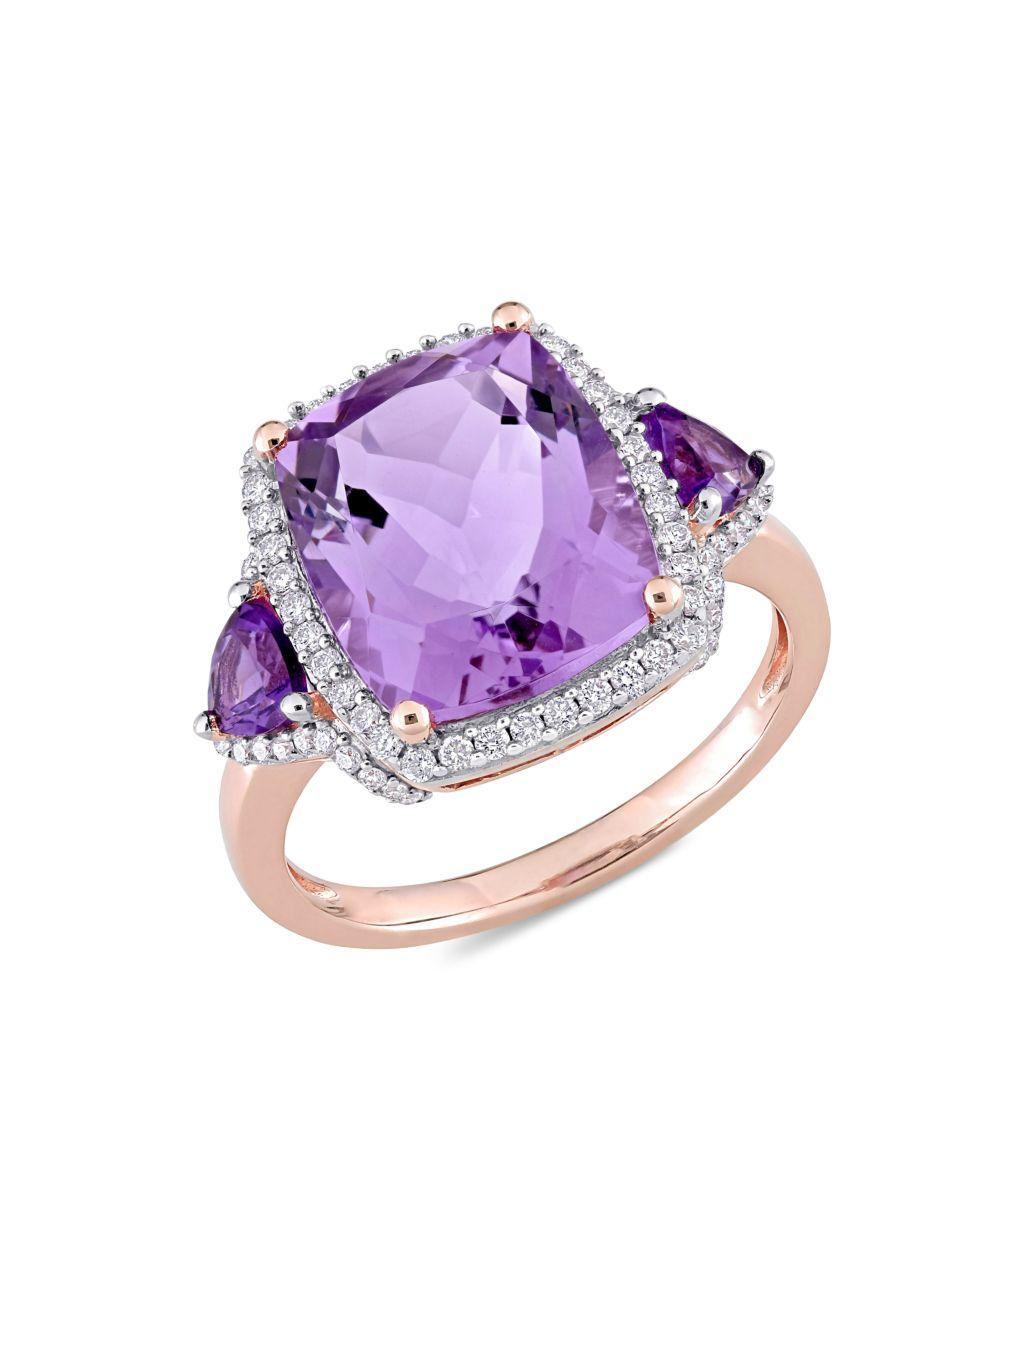 Sonatina 14K Rose Gold & Multi-Stone Ring